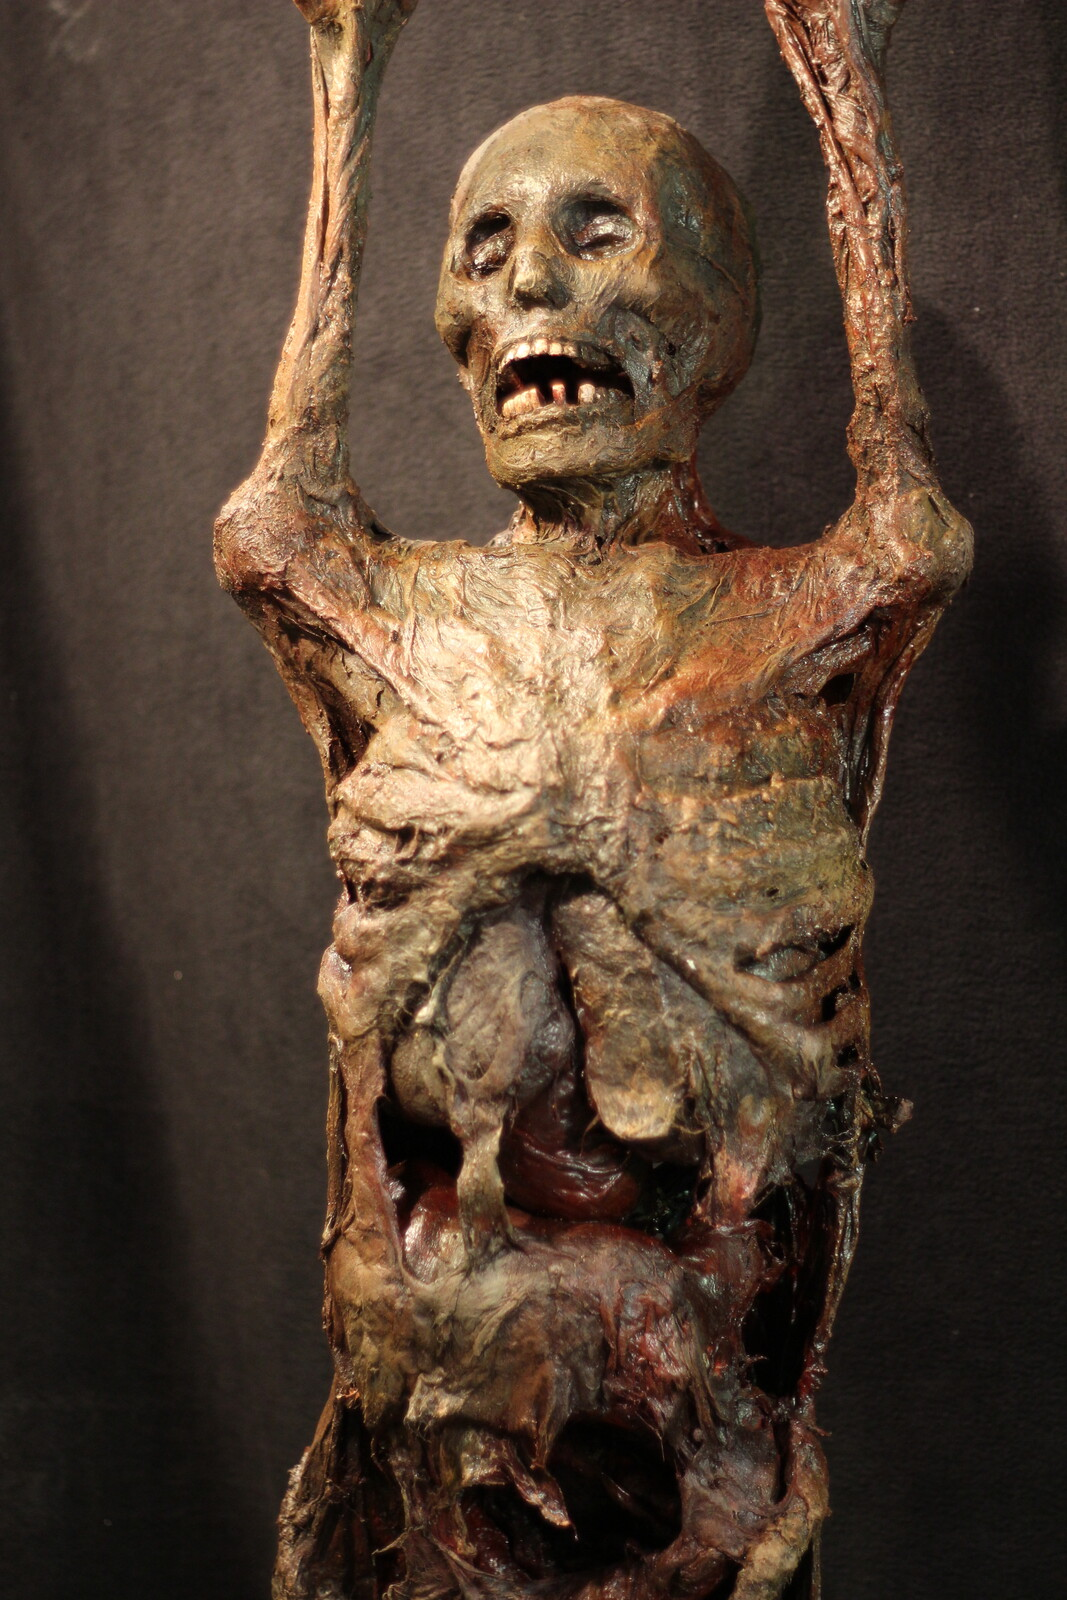 Mortal Kombat Tradeshow Corpse Fabricated Body Prop